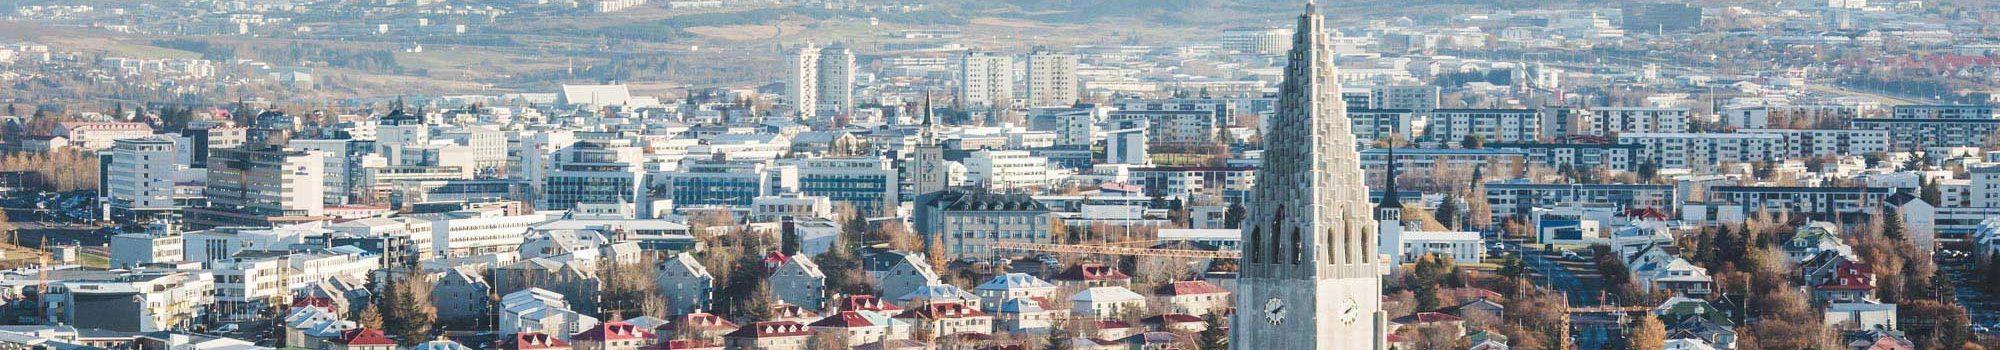 reykjavik-birds-eye-view